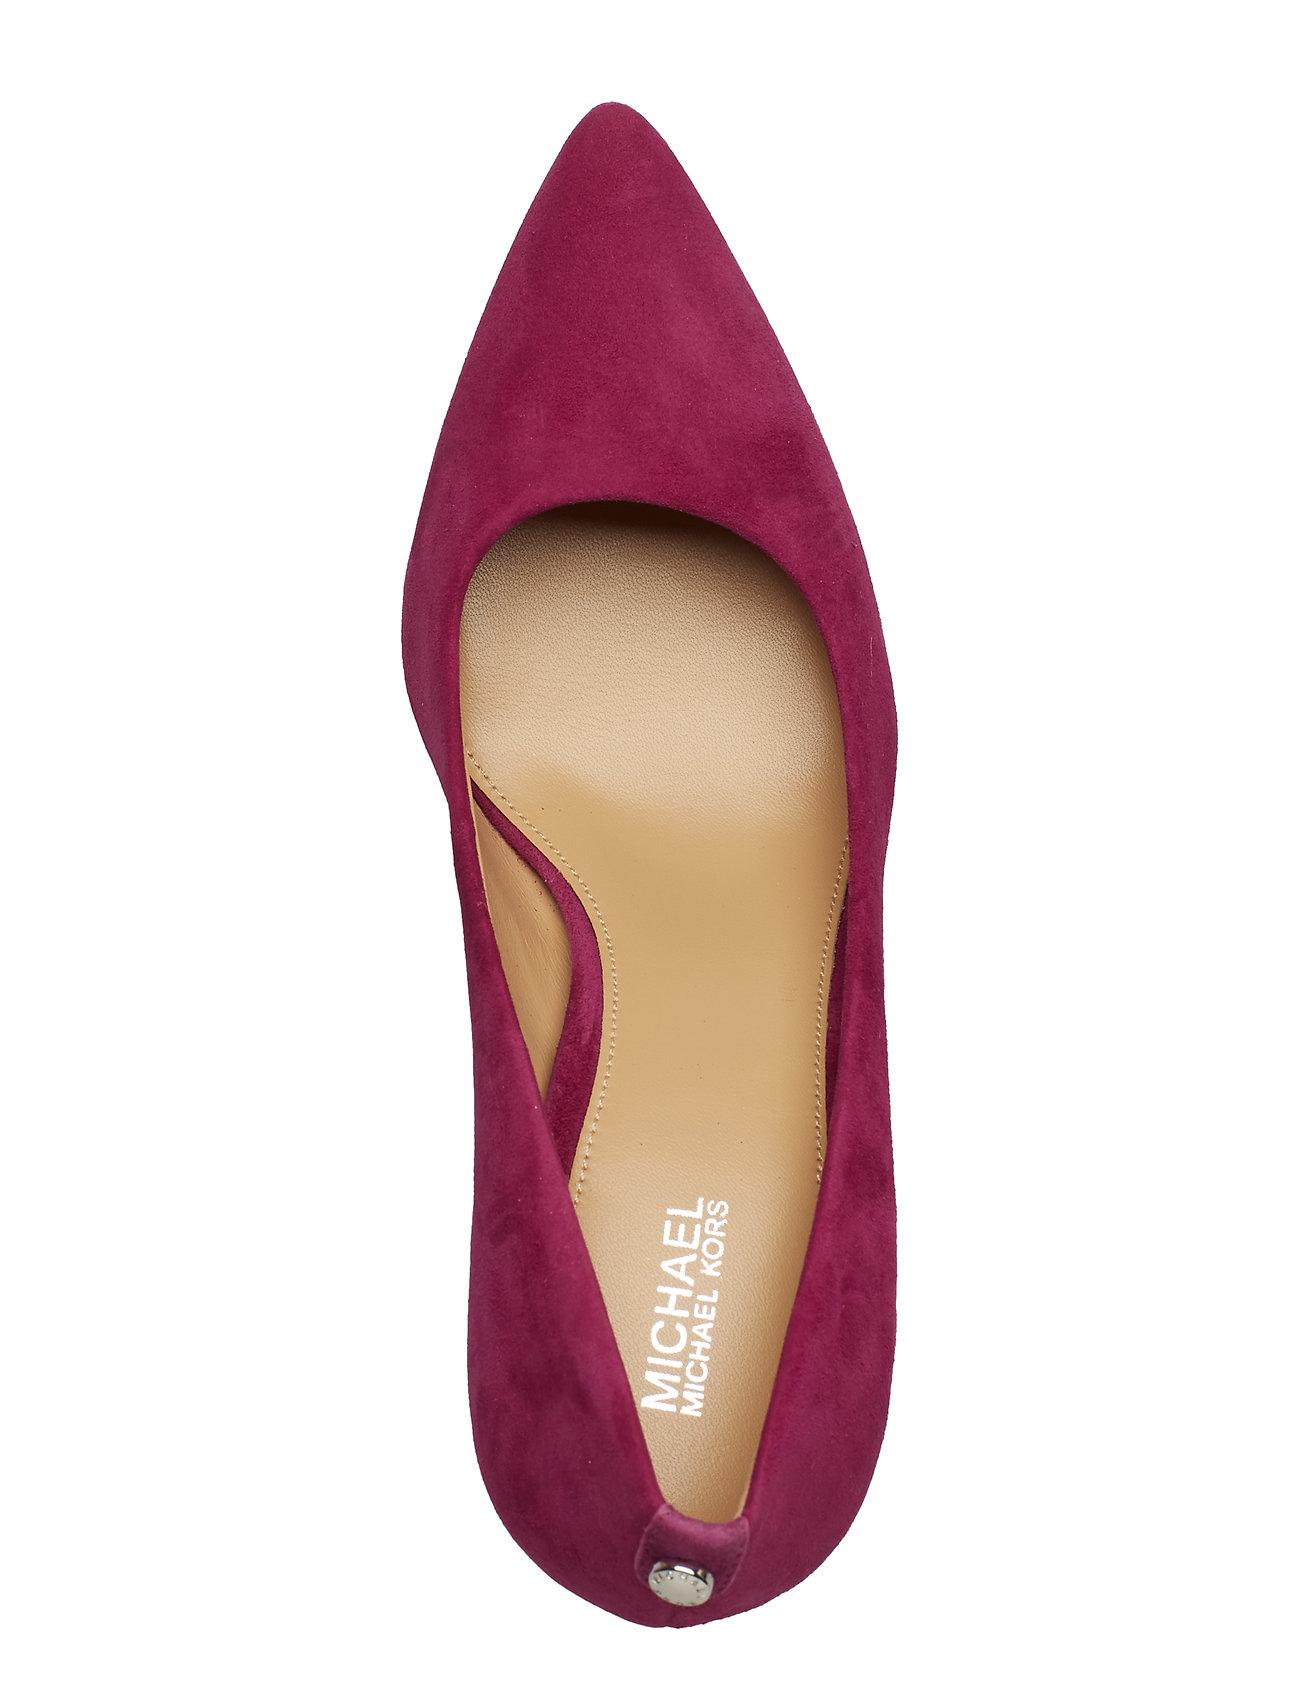 Flex Flex Kors Shoes Dorothy PumpgarnetMichael Shoes PumpgarnetMichael Dorothy Kors Dorothy rCeoBdx